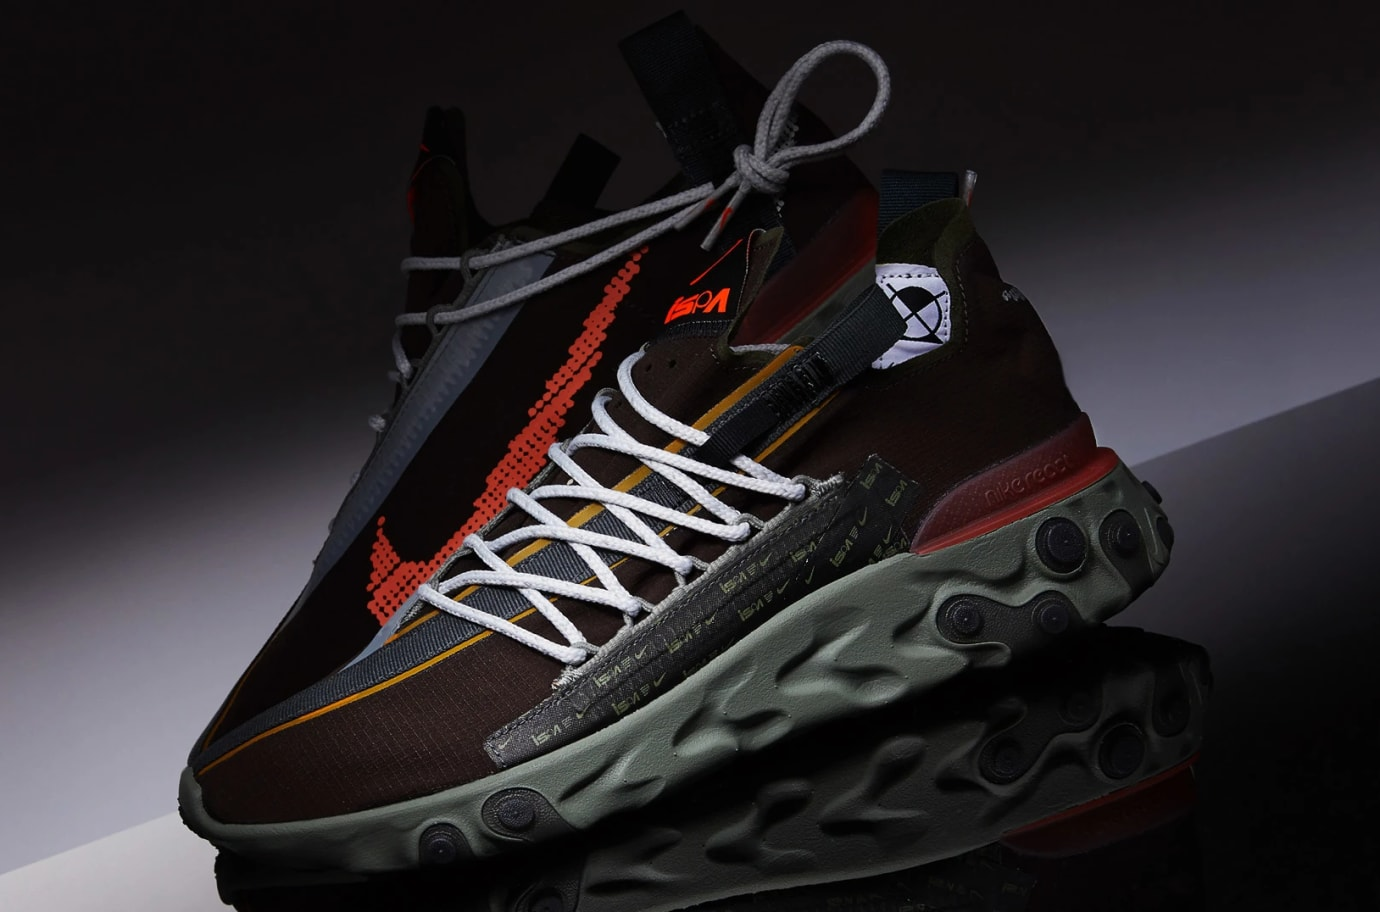 Nike React WR ISPA 'Velvet Brown/Terra Orange' AR8555-200 (Pair)